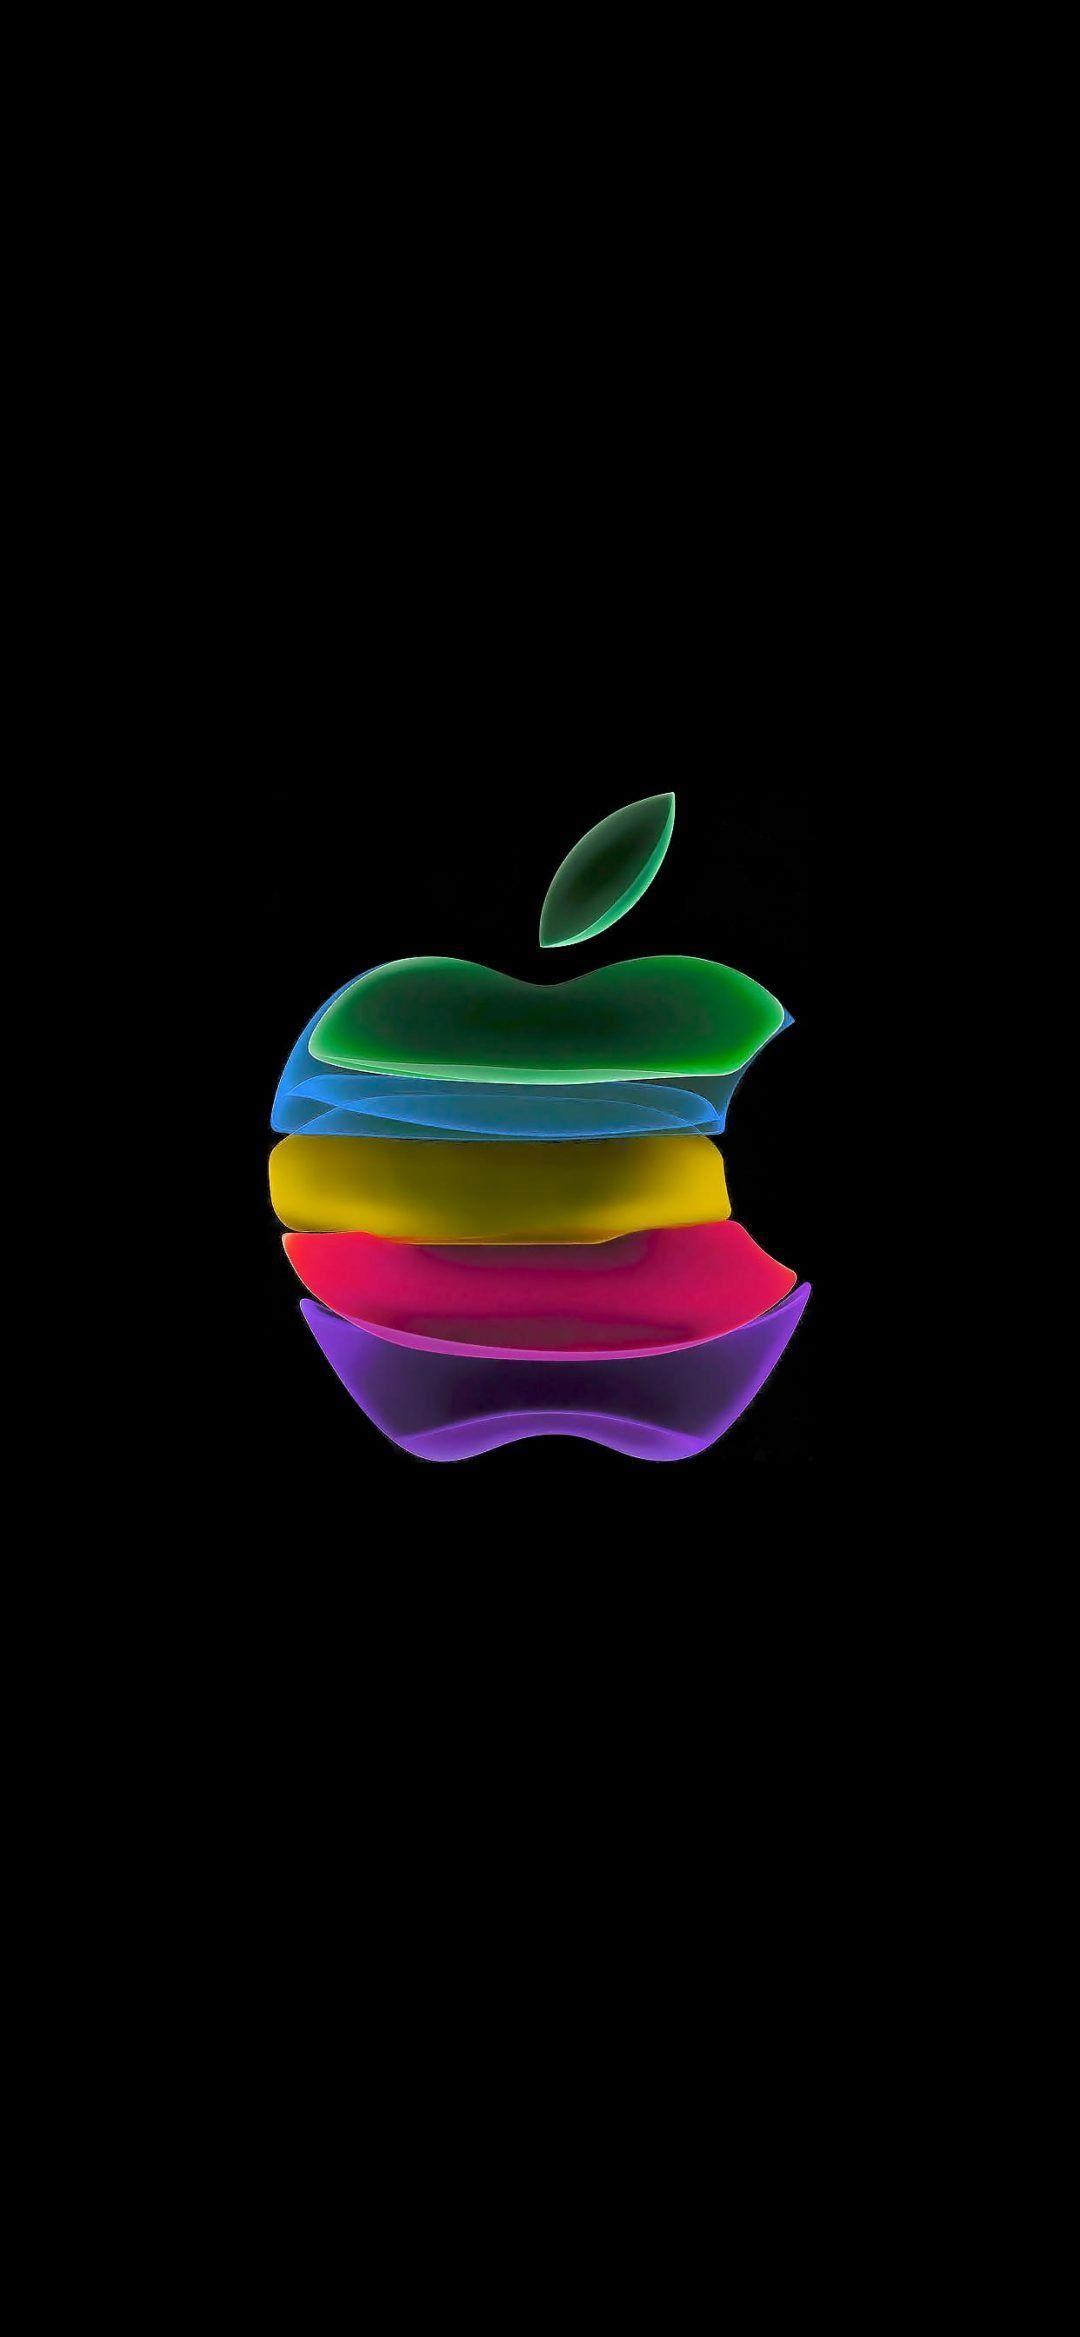 Iphone 11 Pro Wallpaper Hd Download Apple Logo Wallpaper Iphone Apple Iphone Wallpaper Hd Apple Wallpaper Iphone